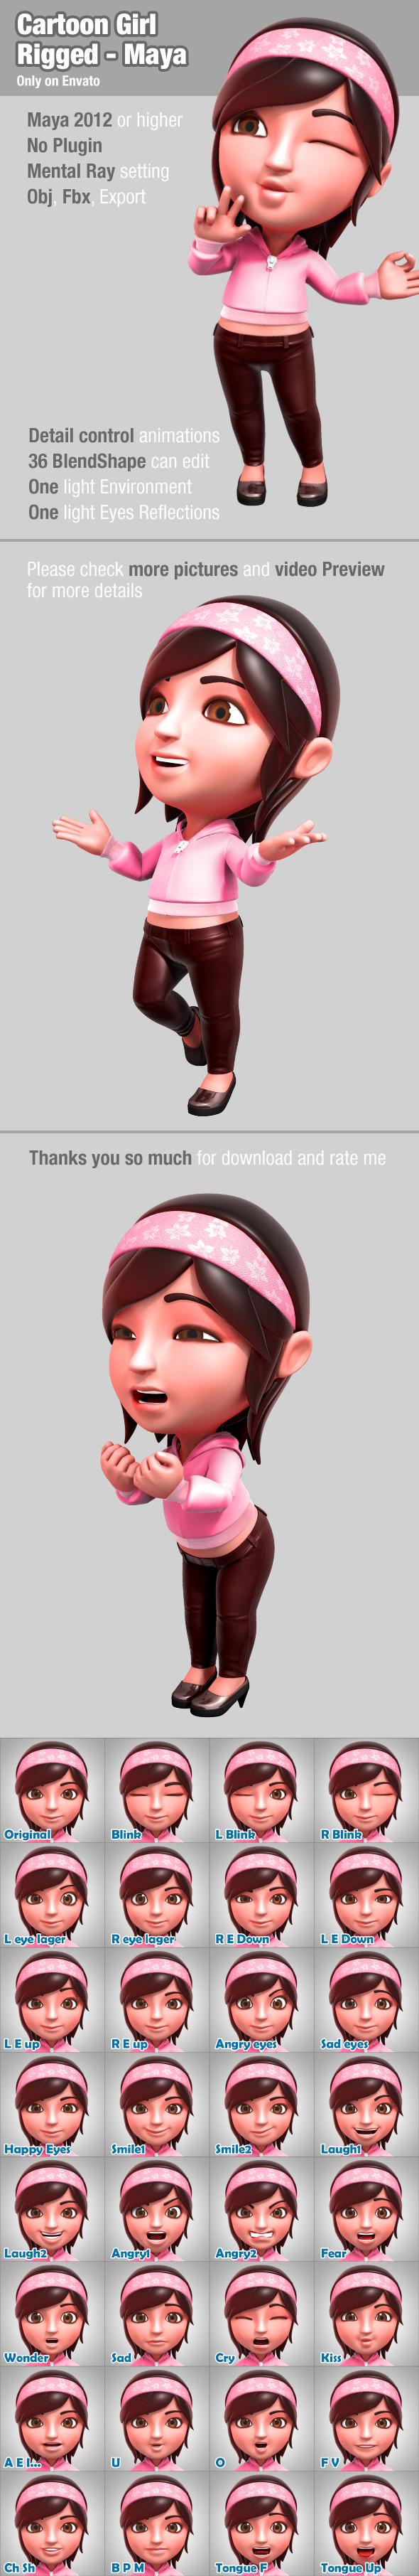 Cartoon Girl Rigged - Maya - 3DOcean Item for Sale